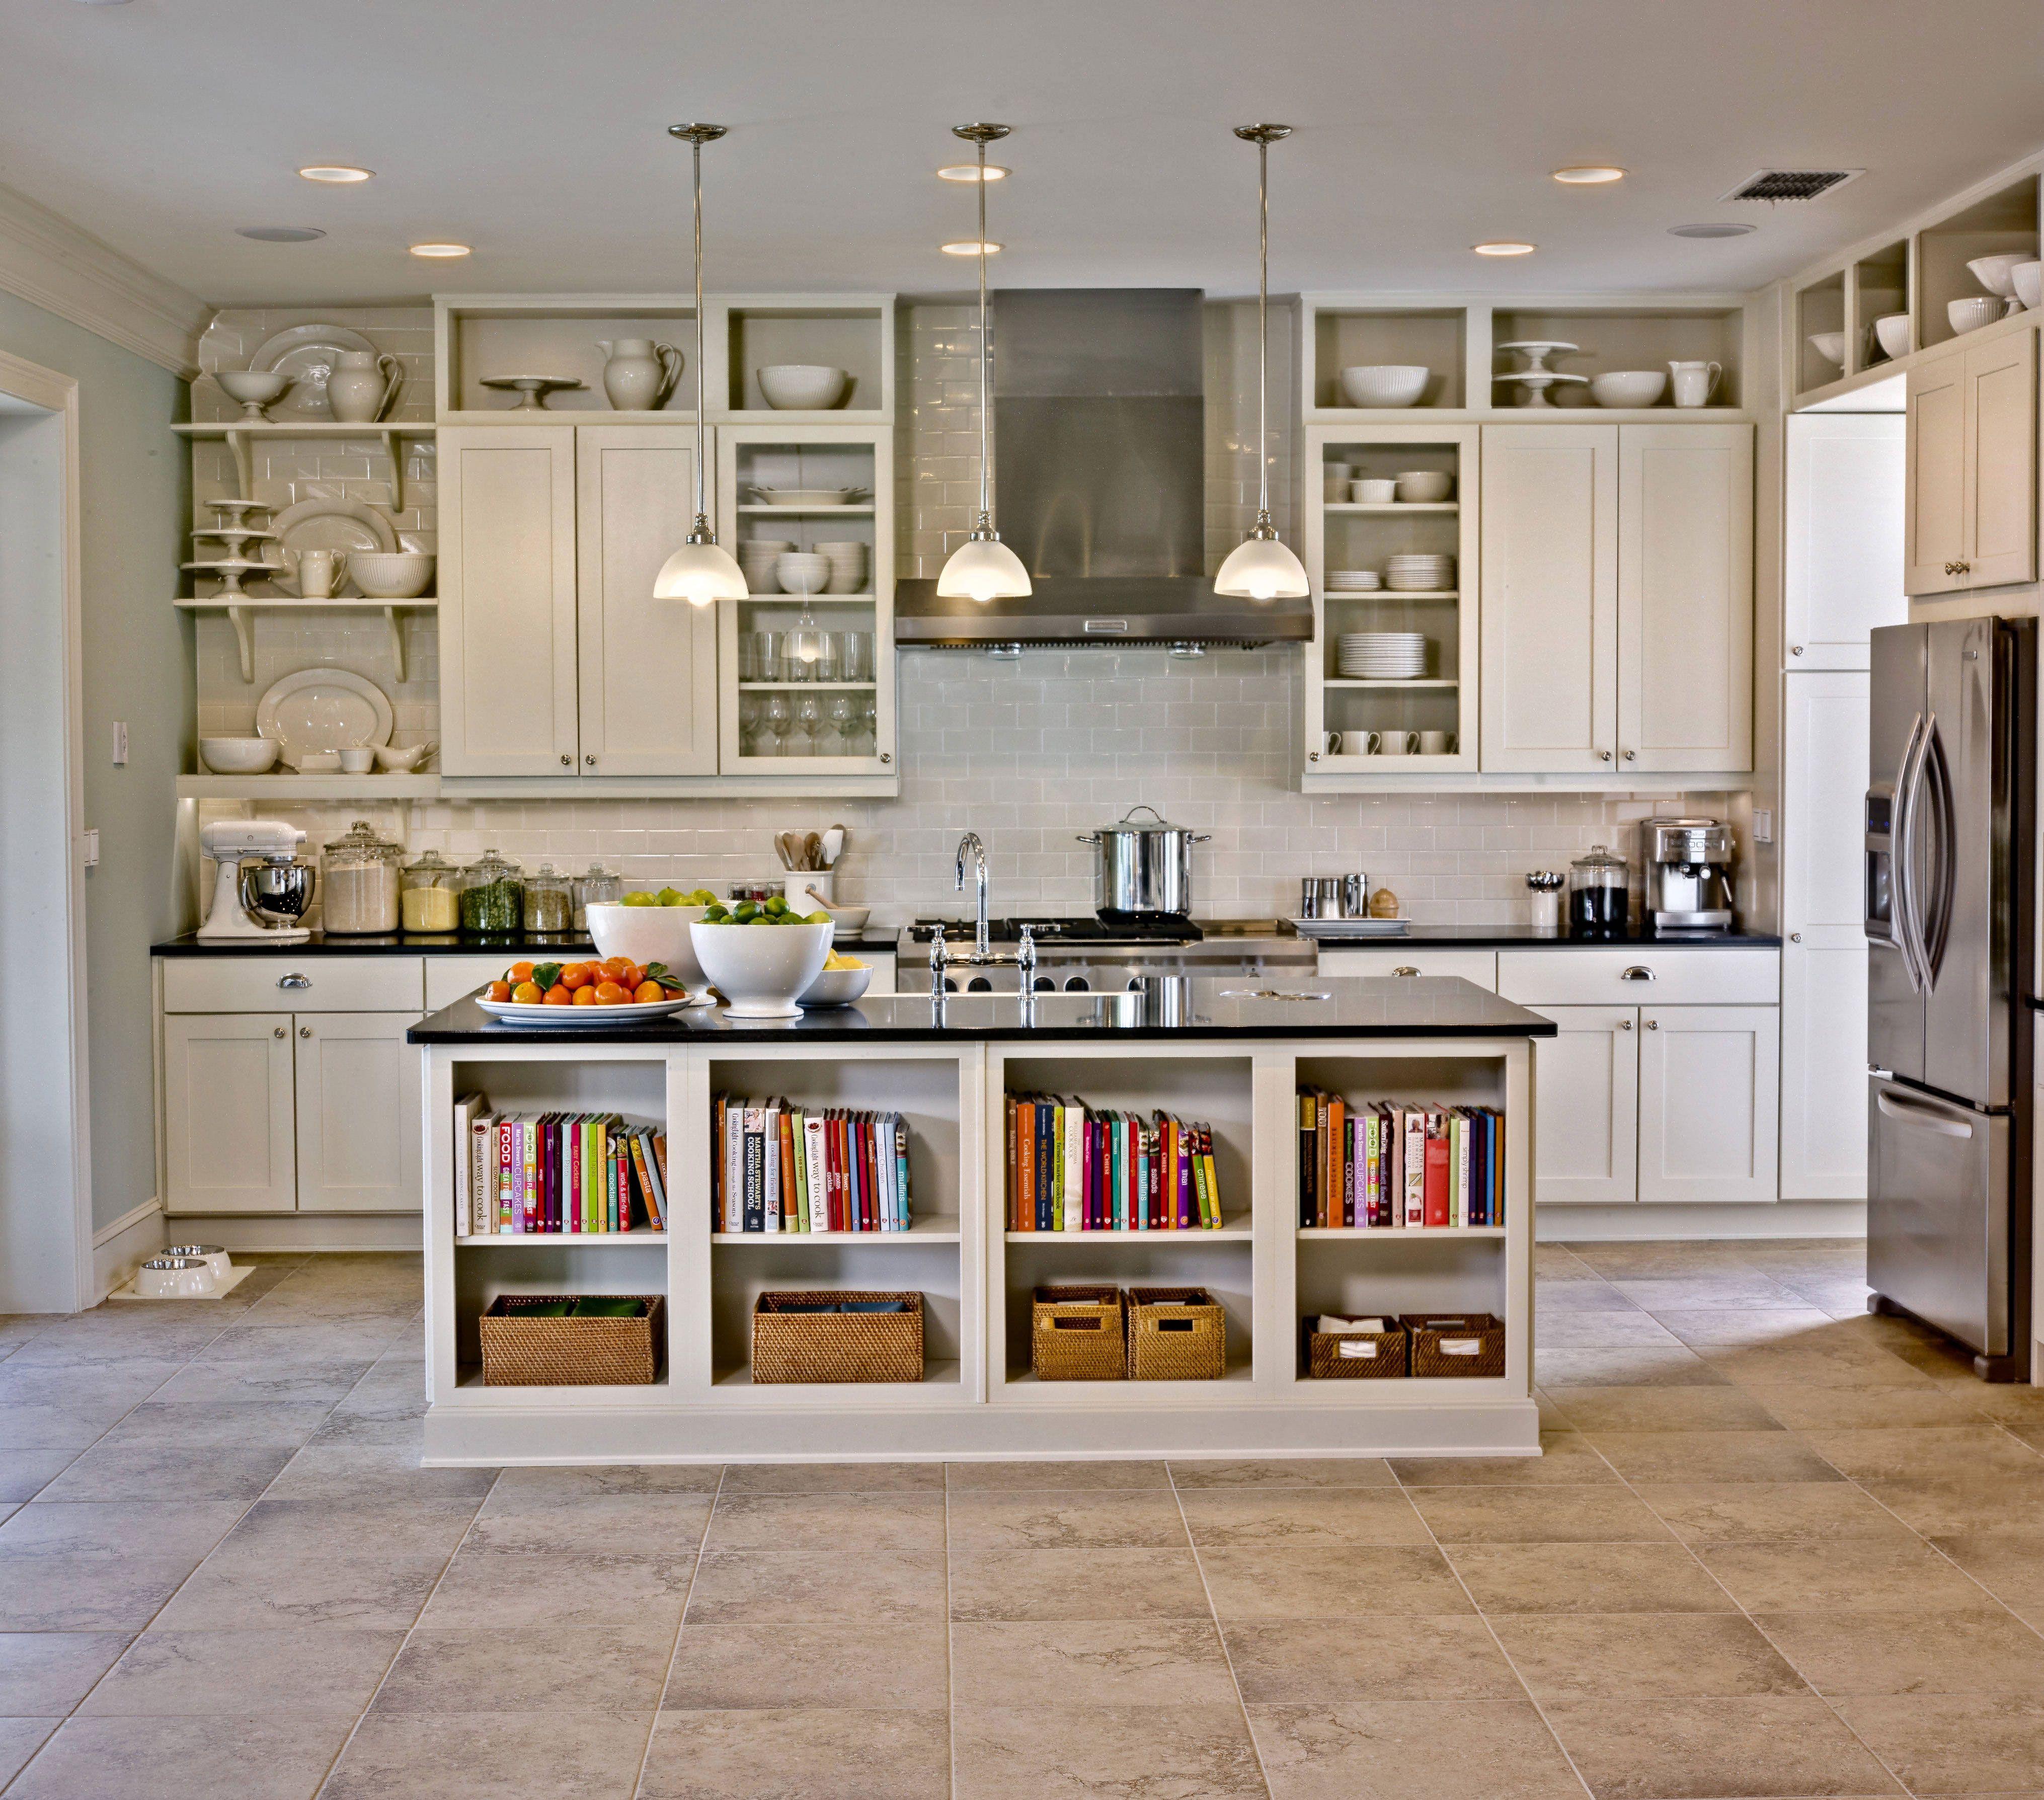 Custom Kitchen Island Design Ideas Home Design And Decor Reviews Above Kitchen Cabinets Kitchen Island Design Kitchen Design